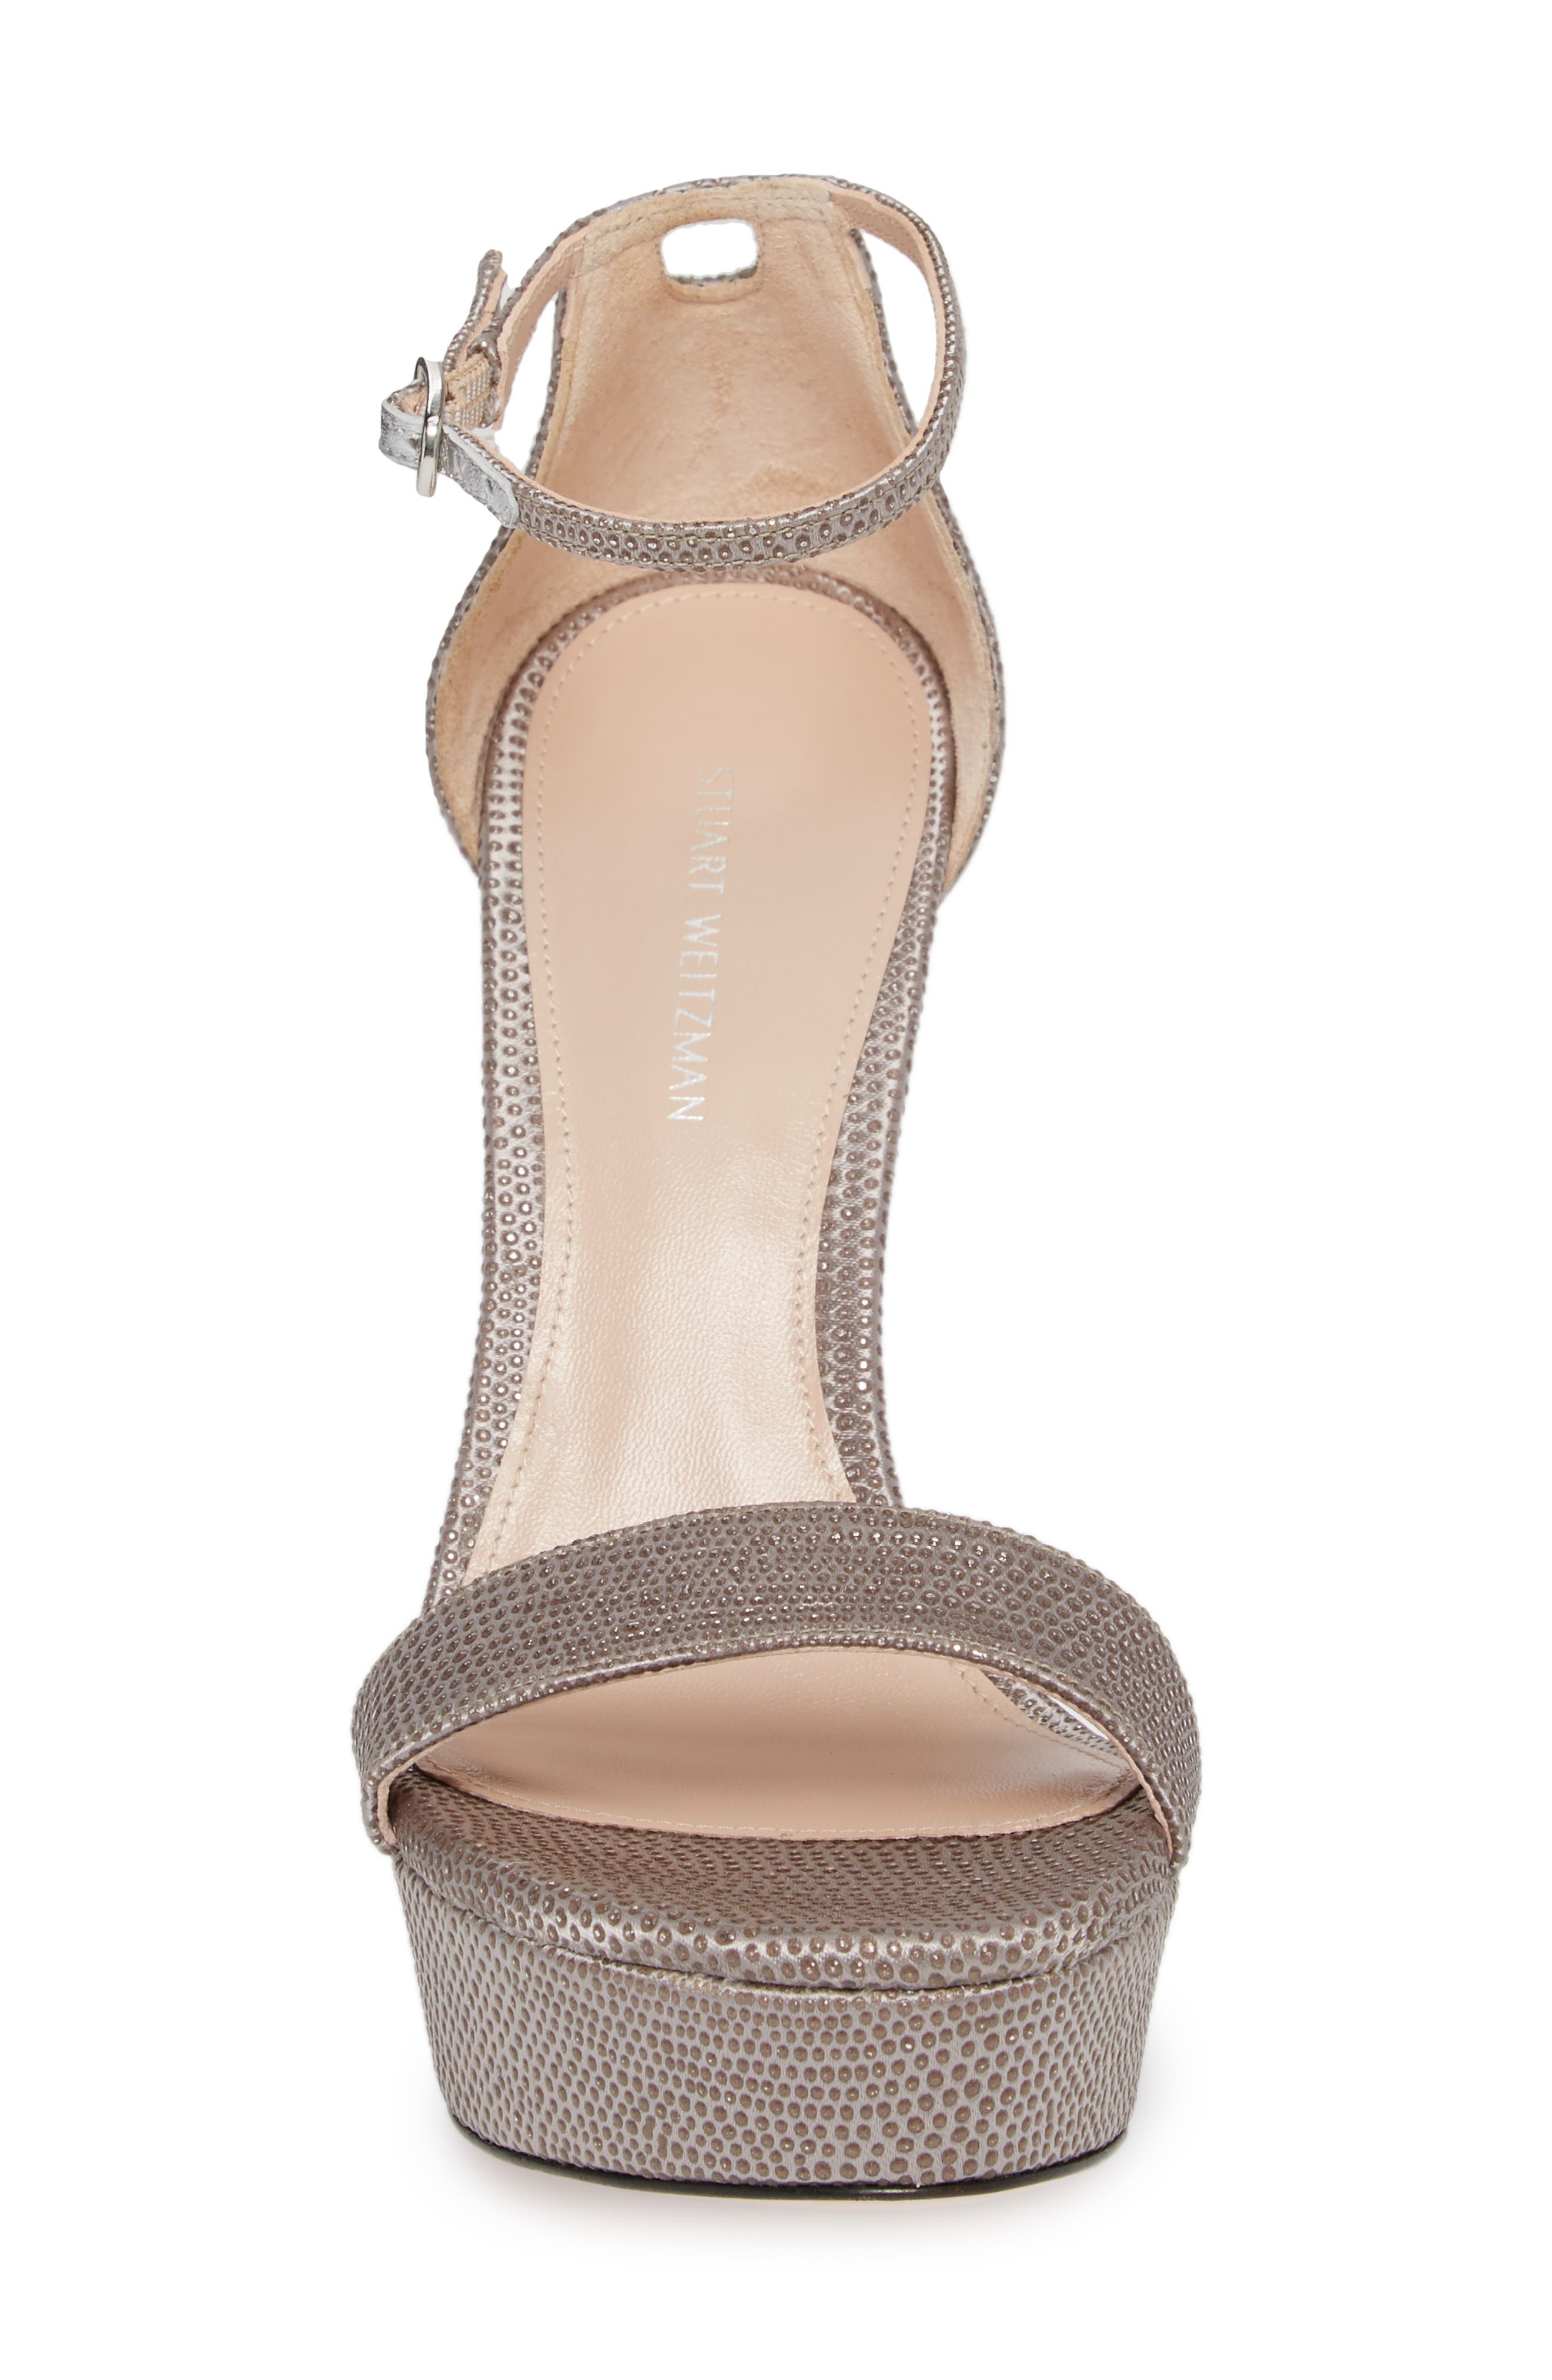 Stuart Weitzamn SOHOT Platform Sandal,                             Alternate thumbnail 4, color,                             Plata Crystaline